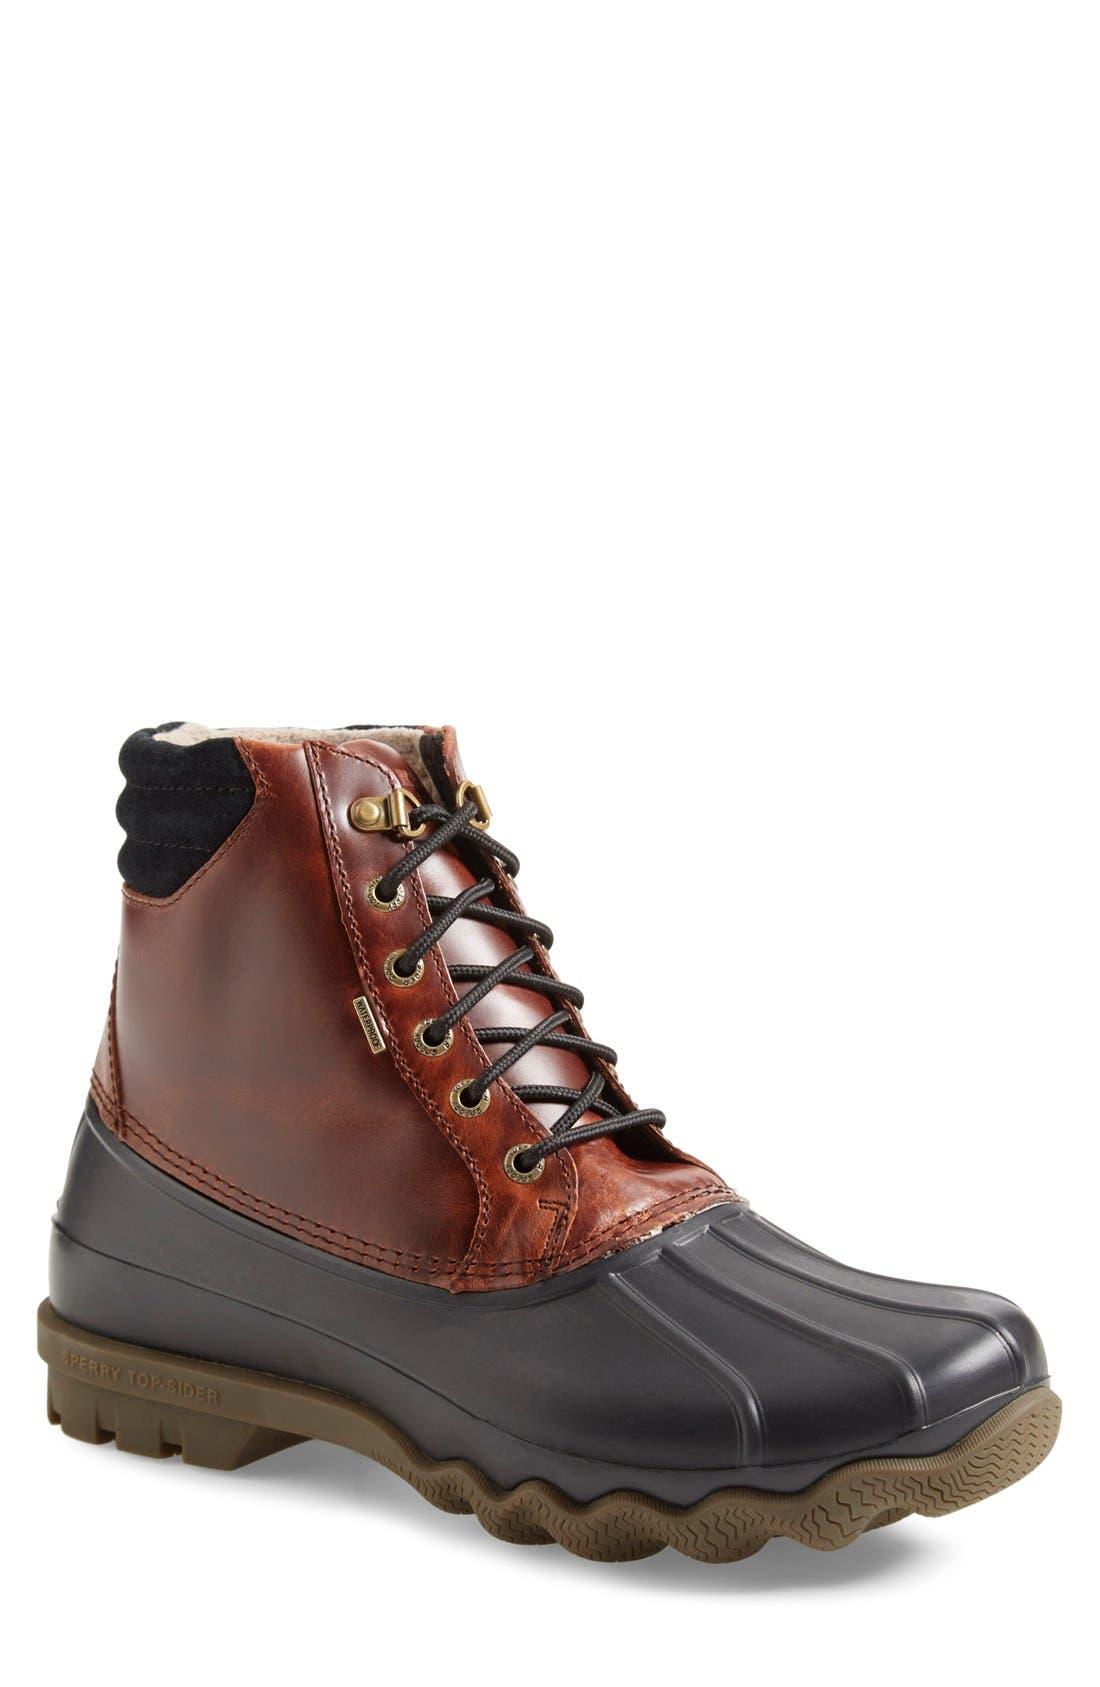 Alternate Image 1 Selected - Sperry Top-Sider® 'Avenue' Rain Boot (Men)